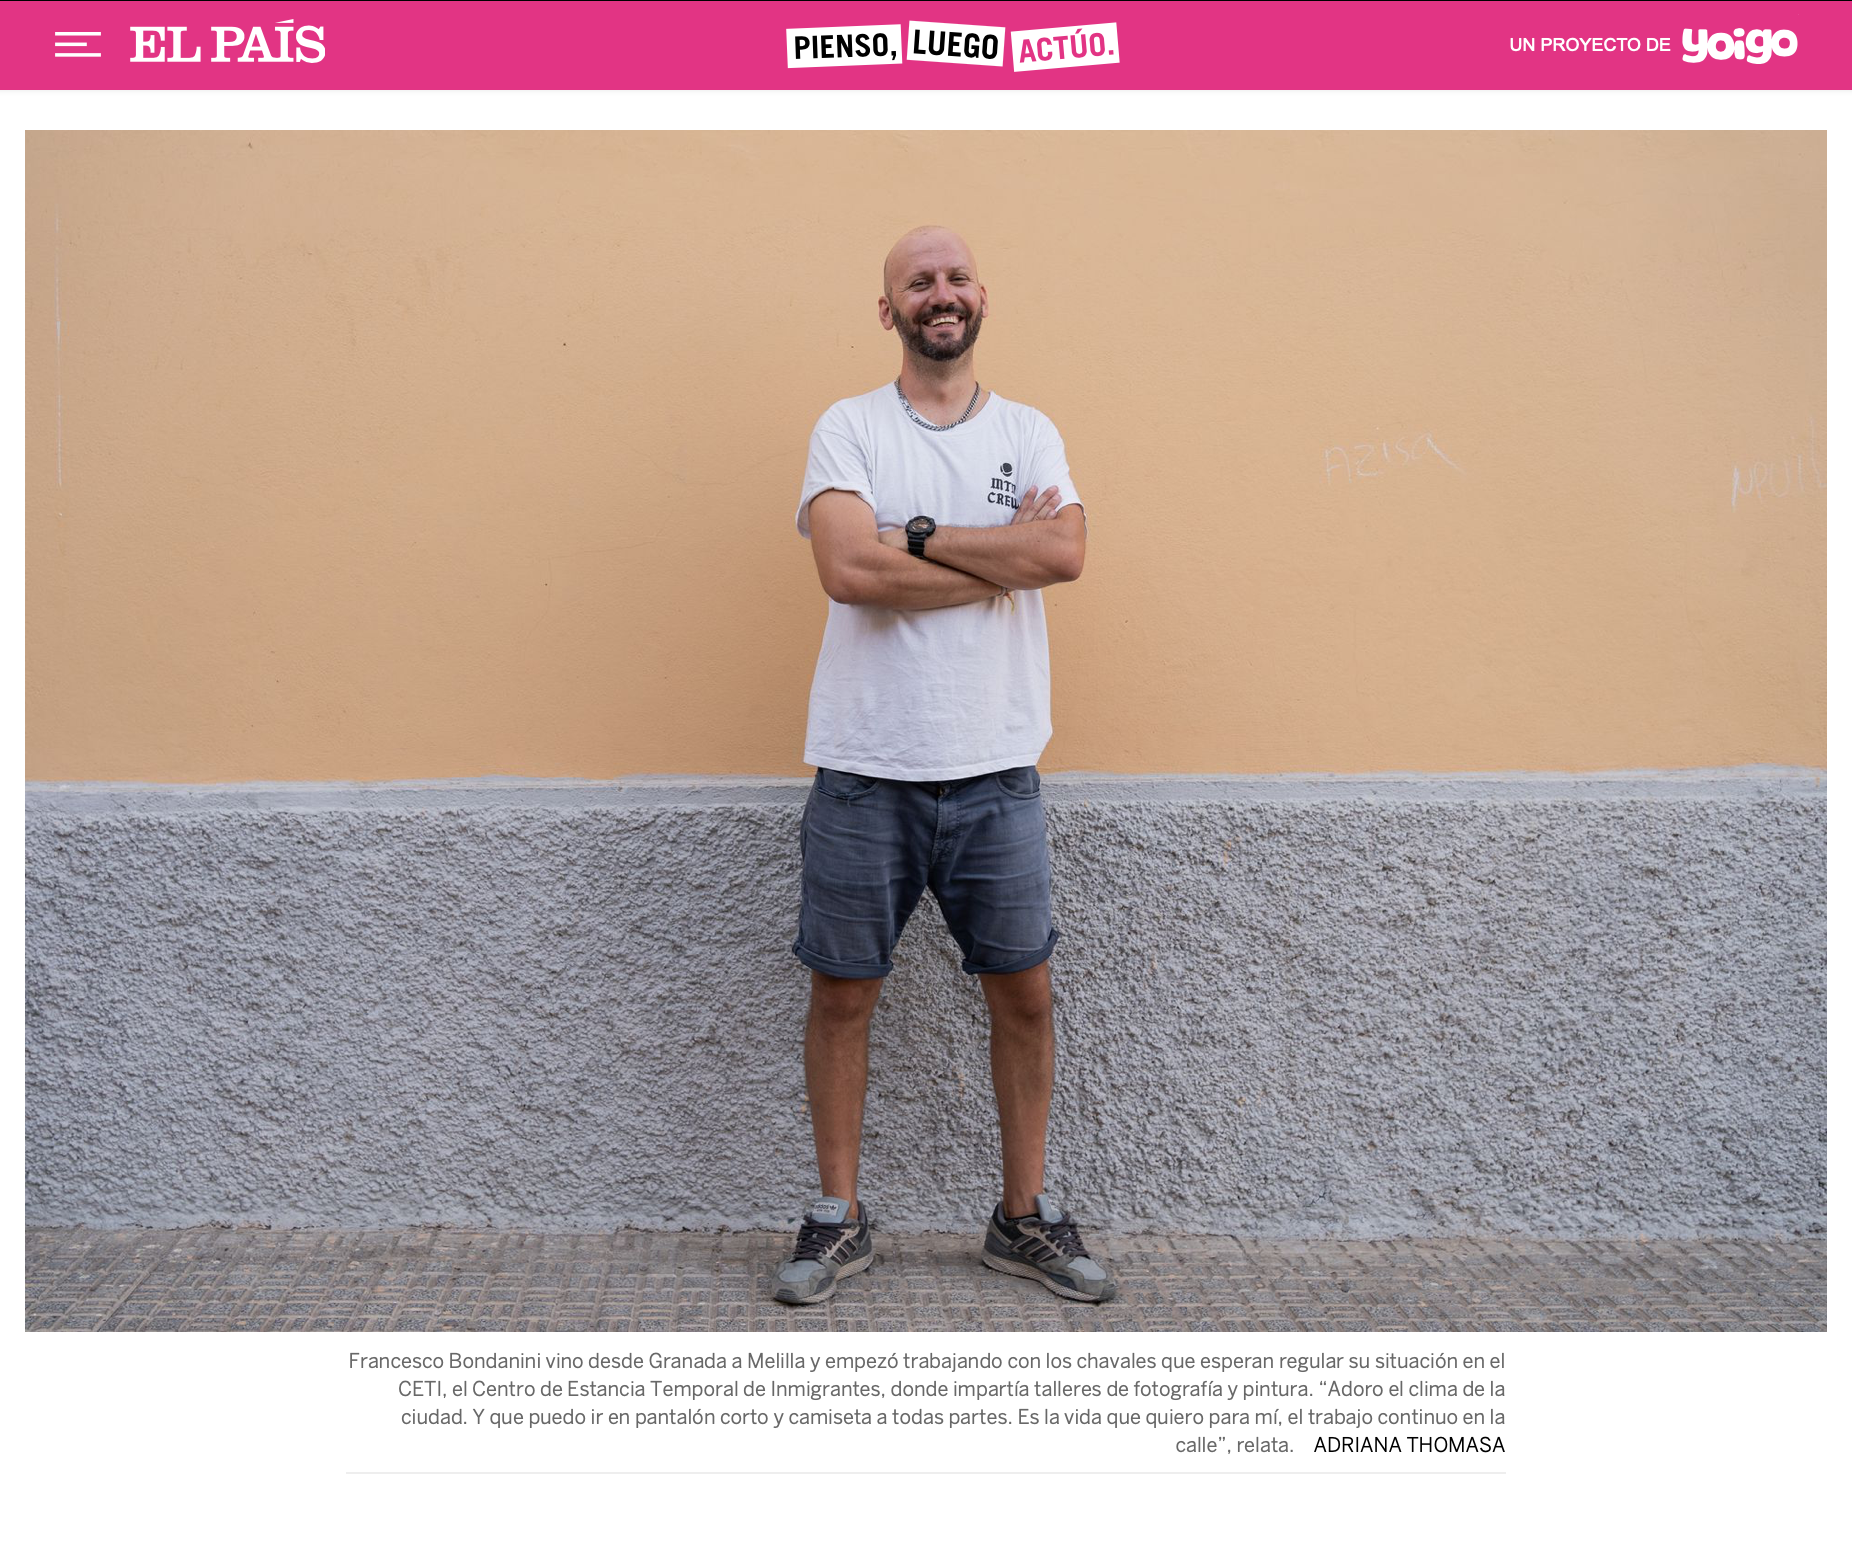 Photography image - Loading Captura_de_Pantalla_2021-09-26_a_la(s)_21.01.42.png